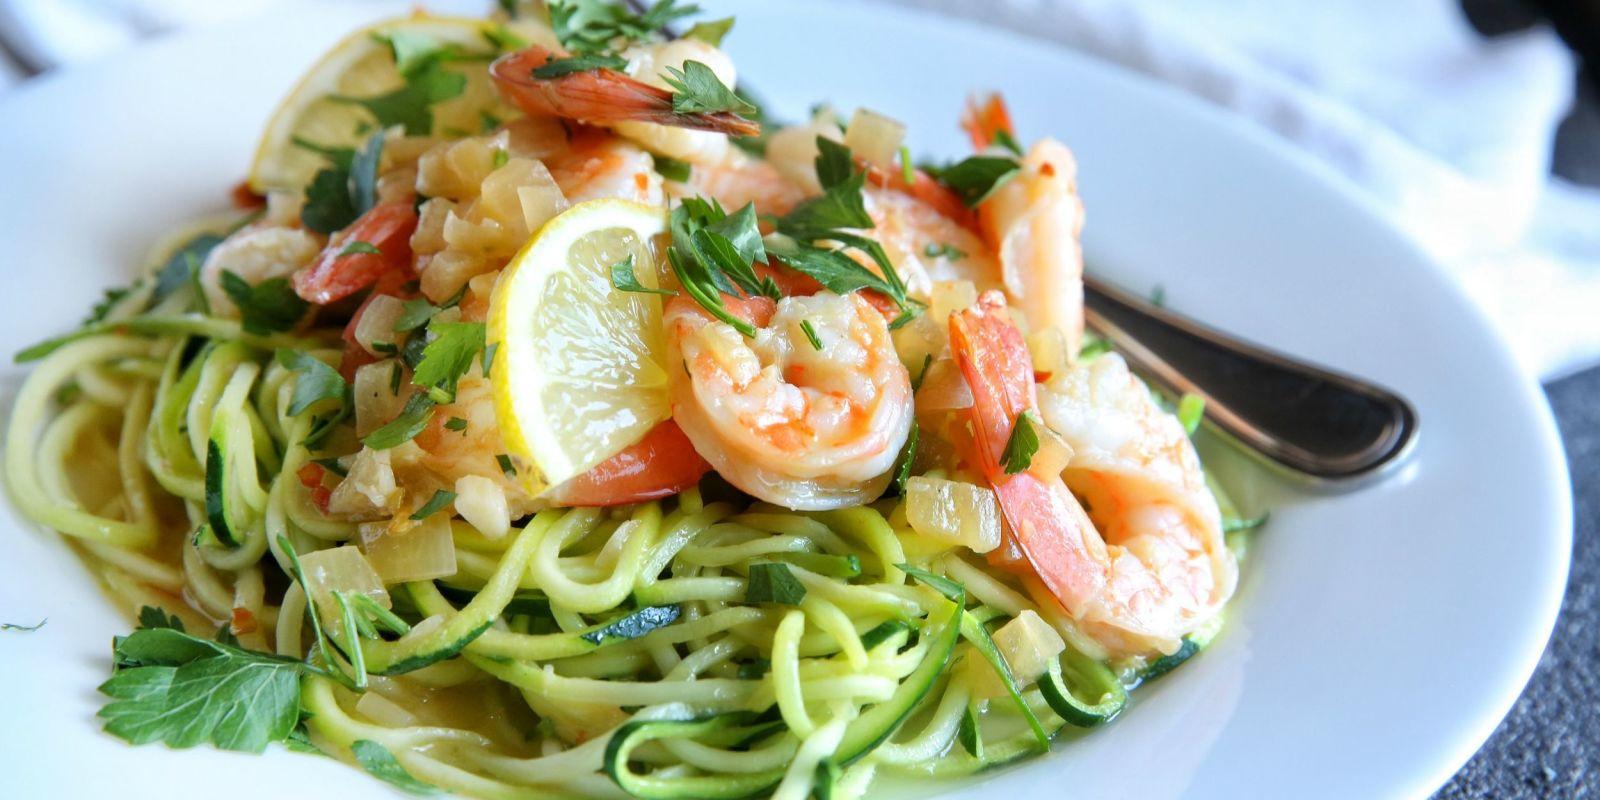 Easy Summer Dinner Recipes  100 Easy Summer Dinner Recipes Best Ideas for Summer